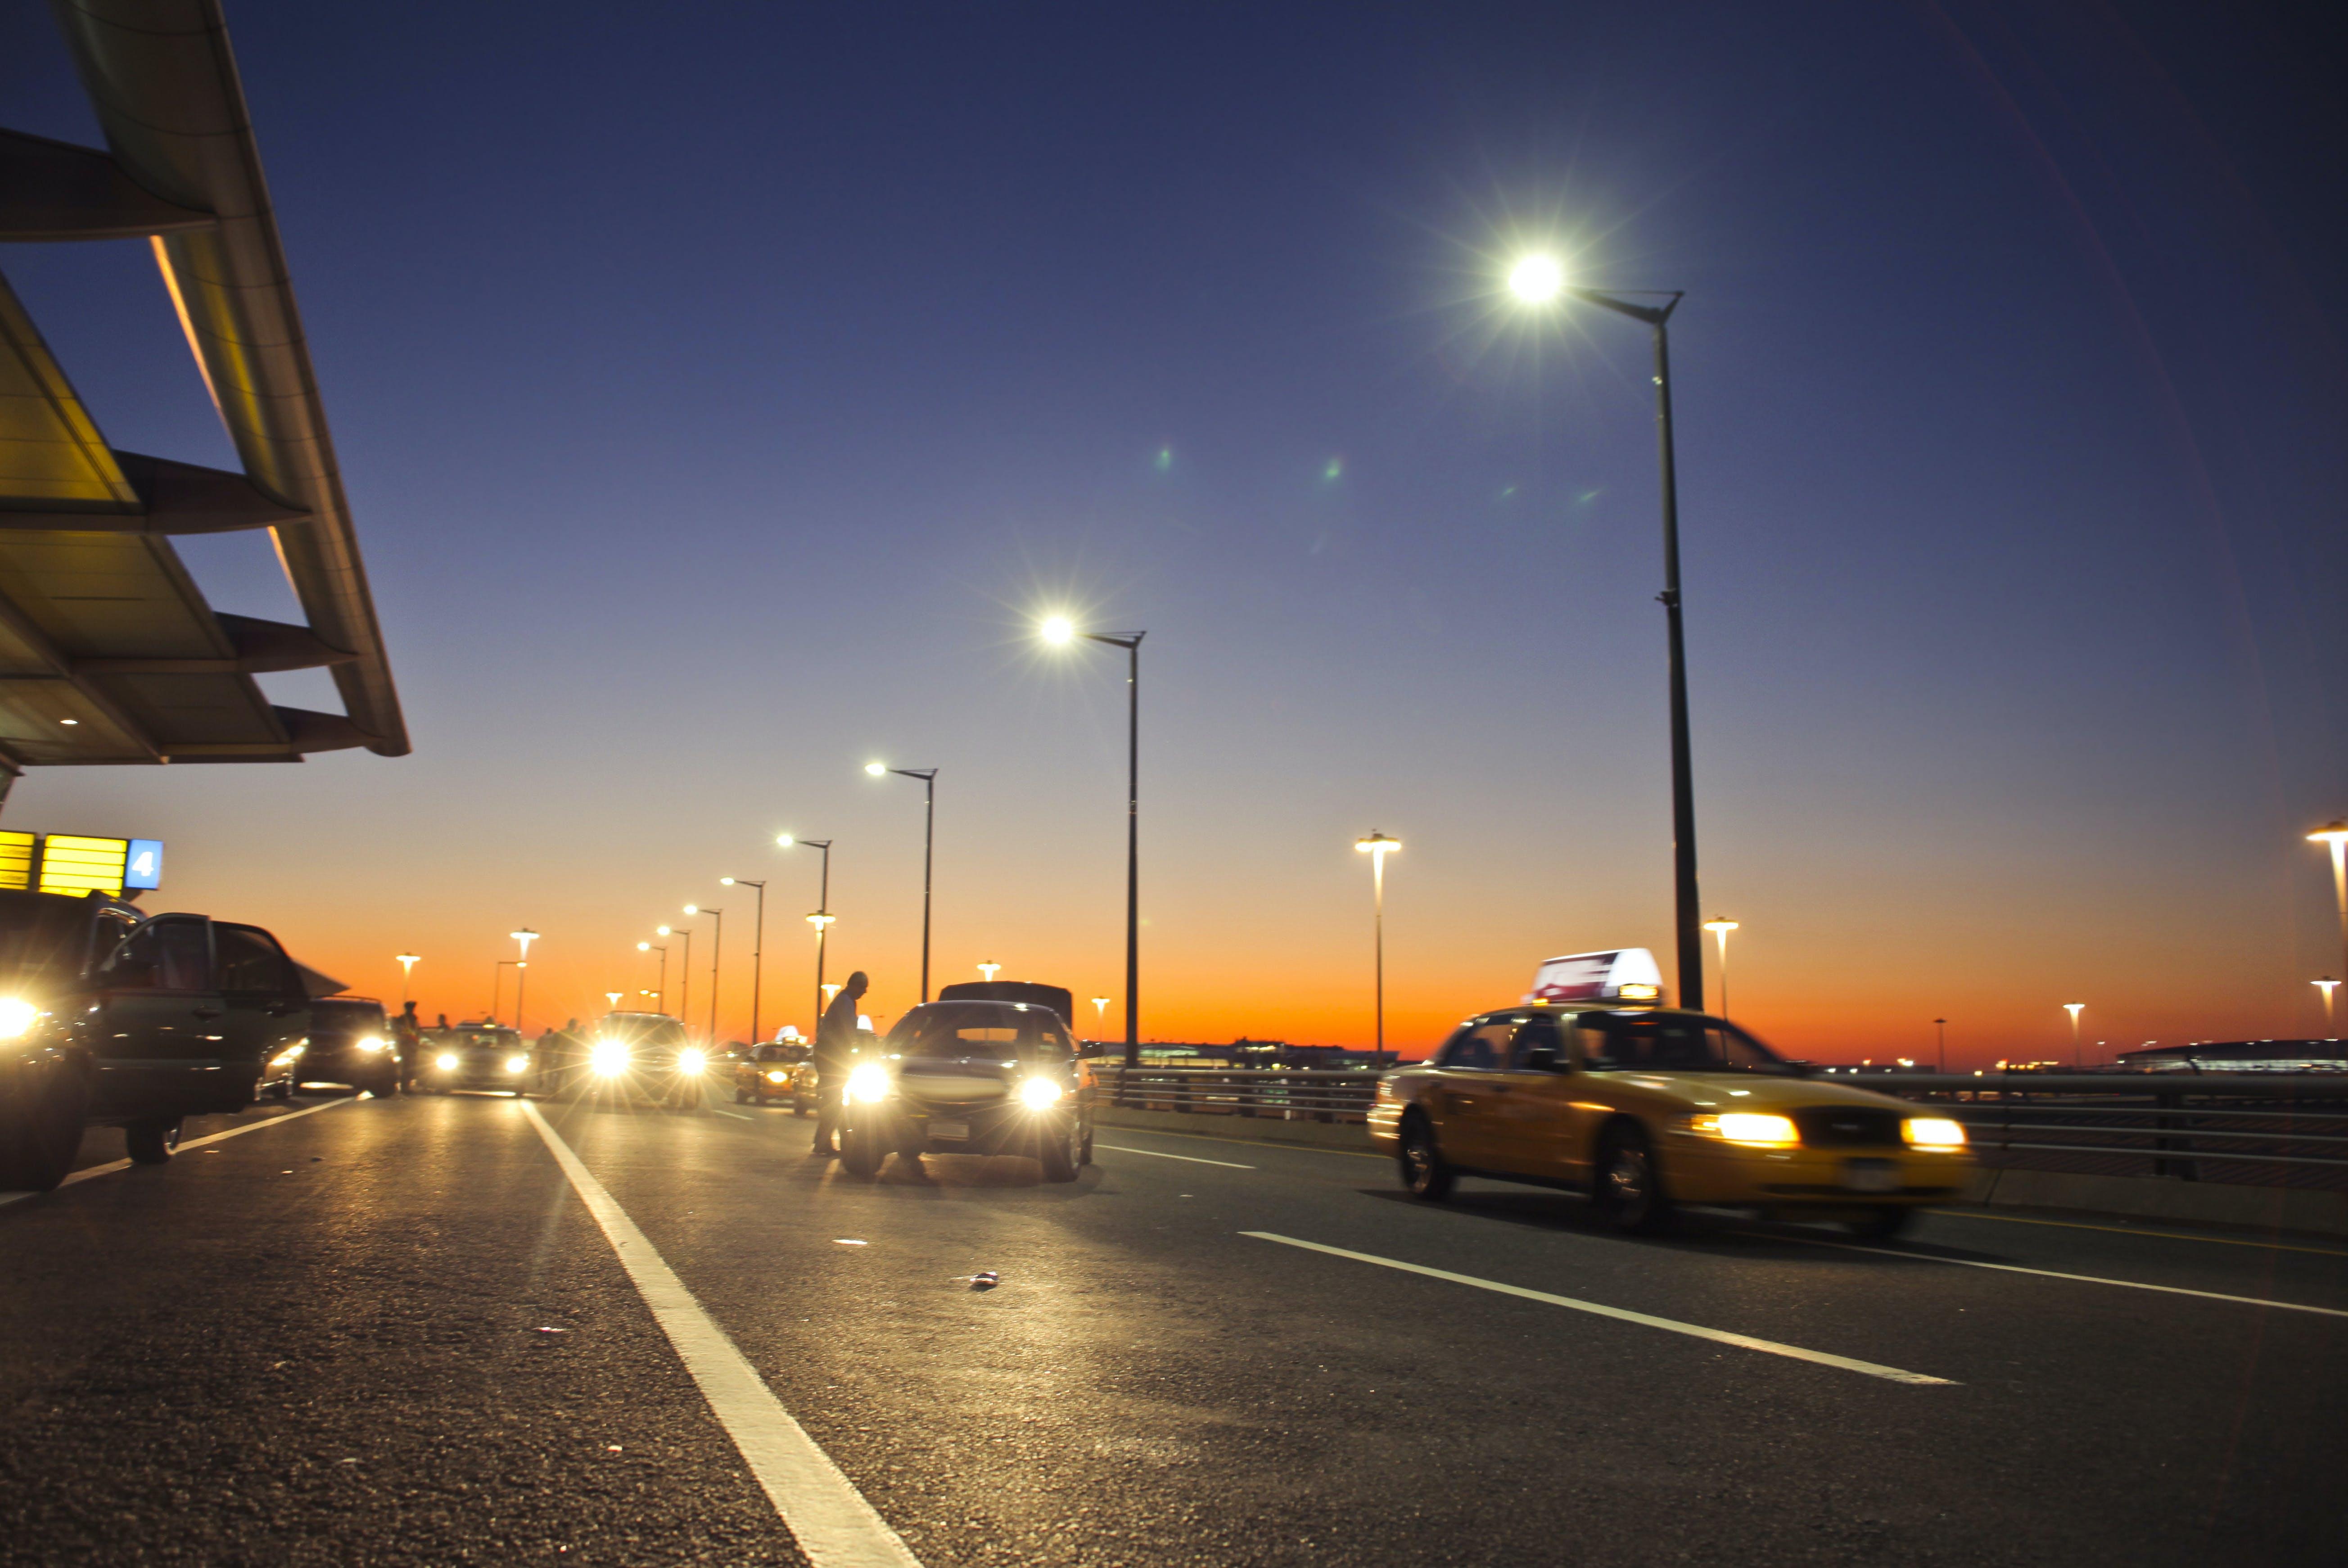 Free stock photo of light, traffic, landscape, sunset